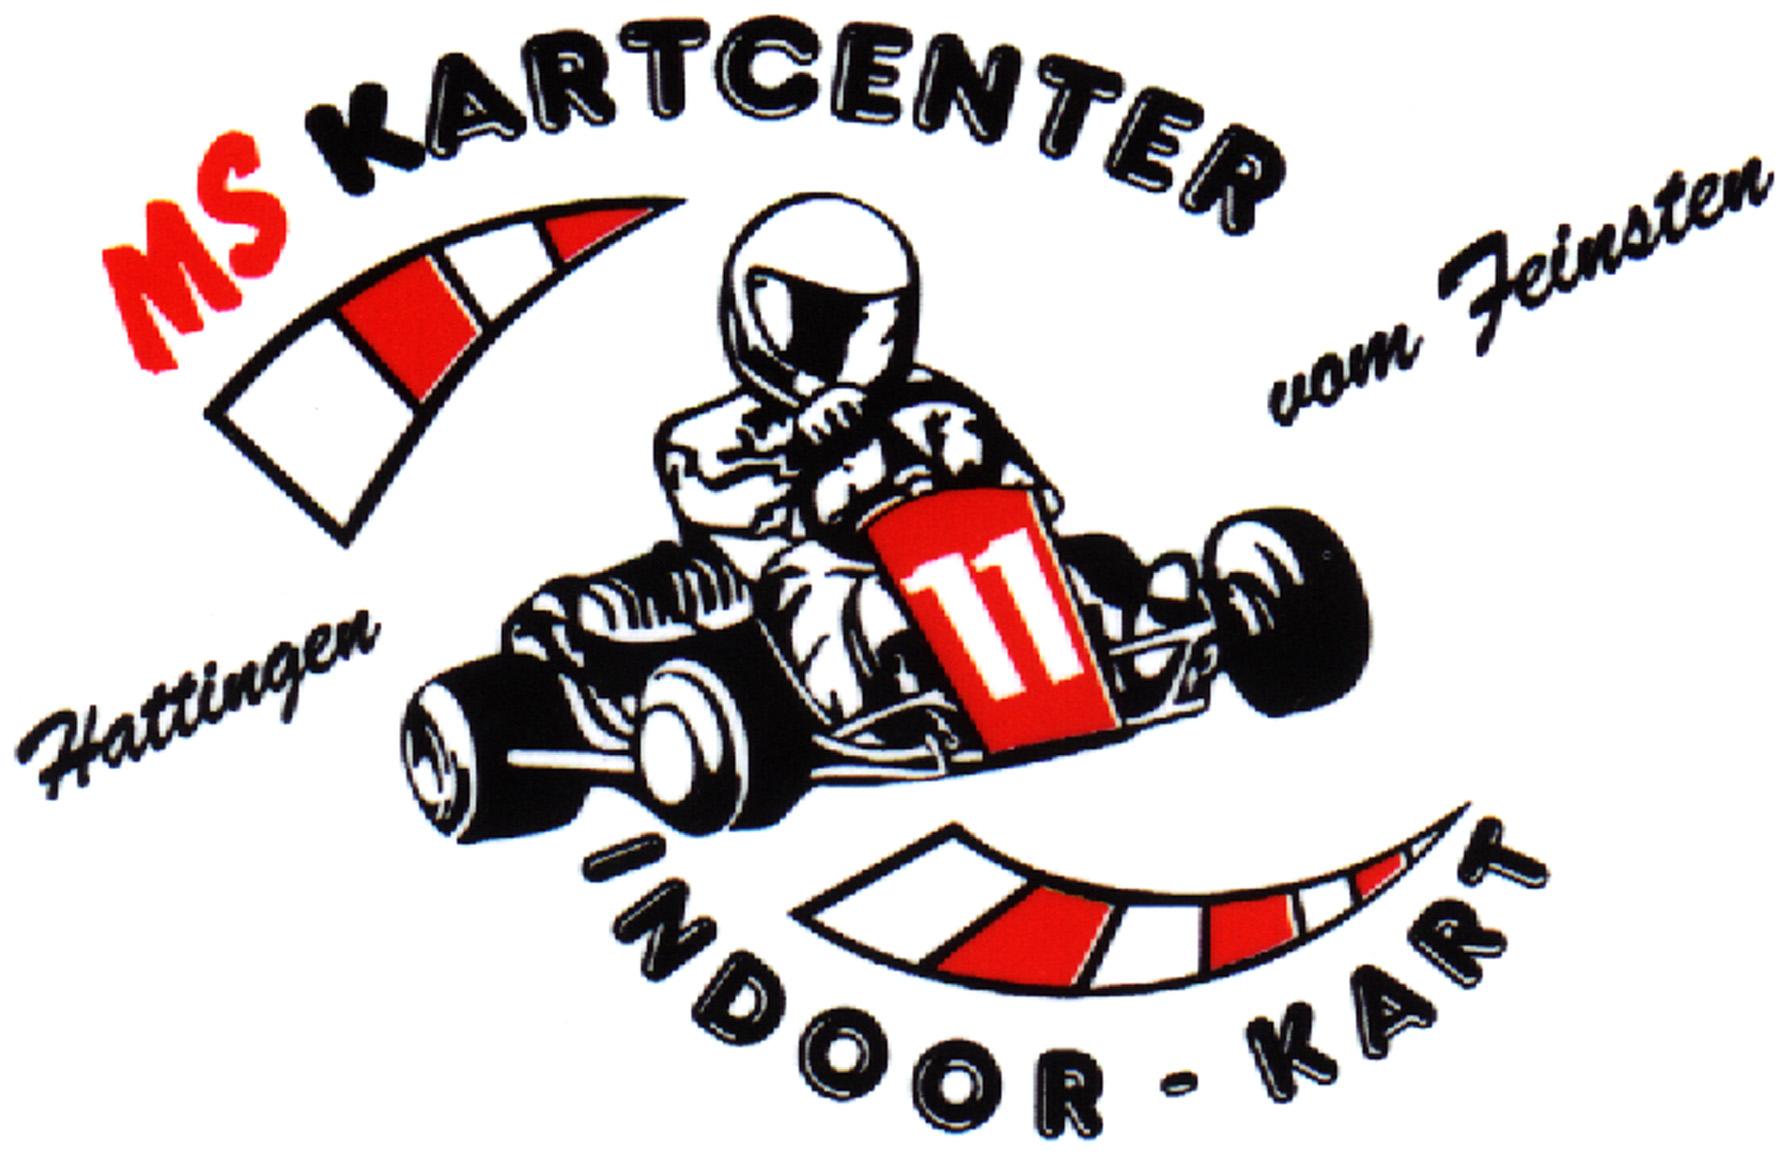 MS Kartcenter Hattingen Logo